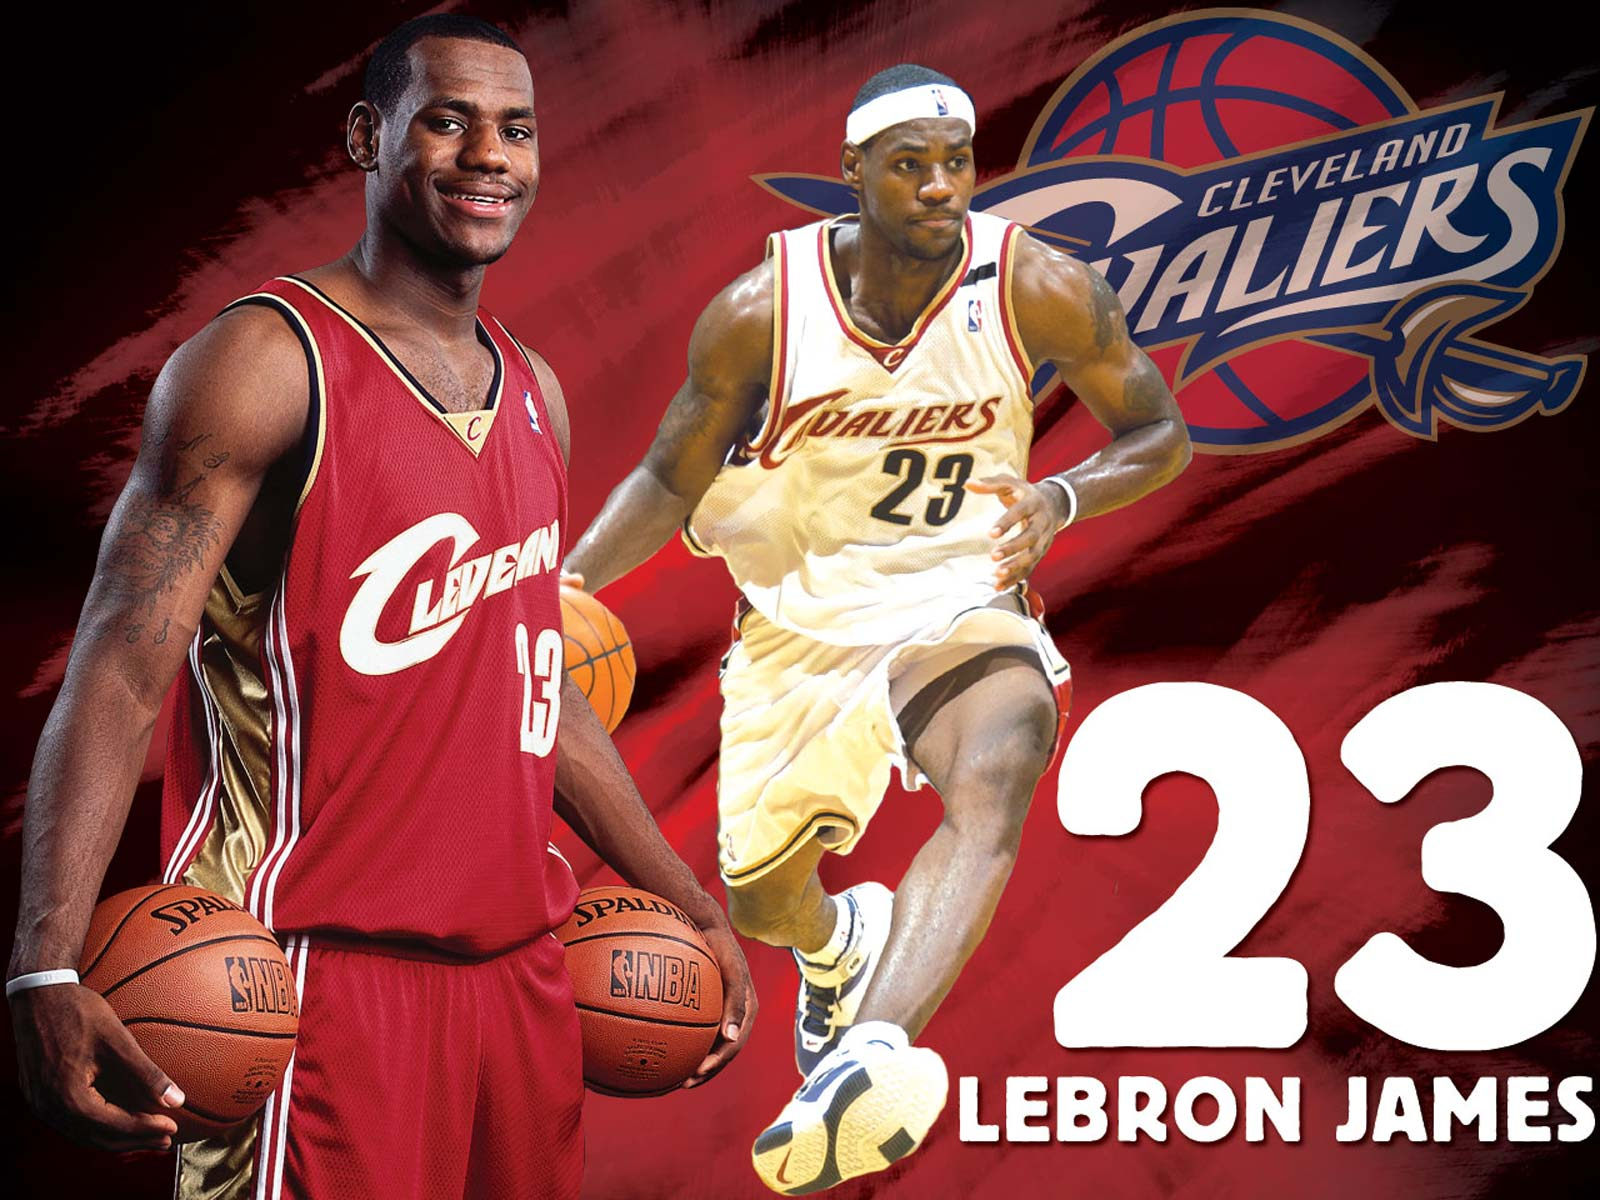 lebron james cavaliers wallpaper basketball wallpapers